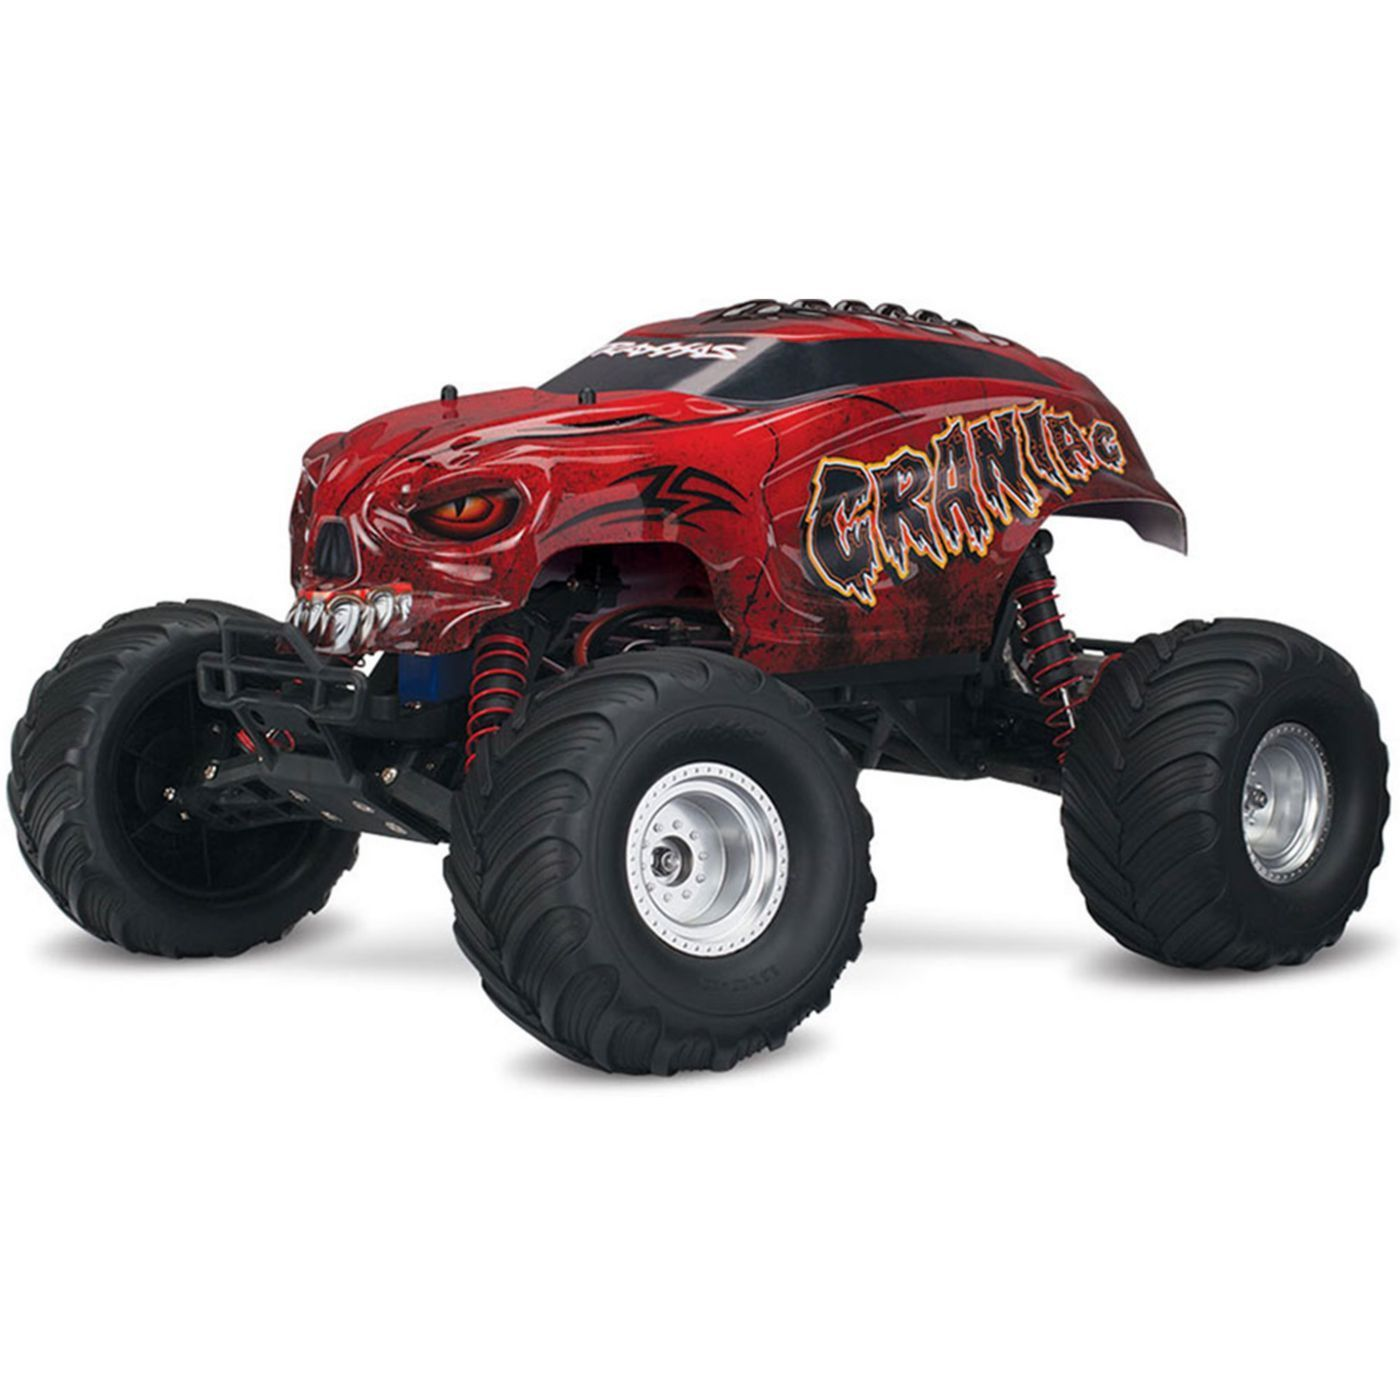 1/10 Craniac RTR Monster Truck, TQ 2.4GHz, Red Monster